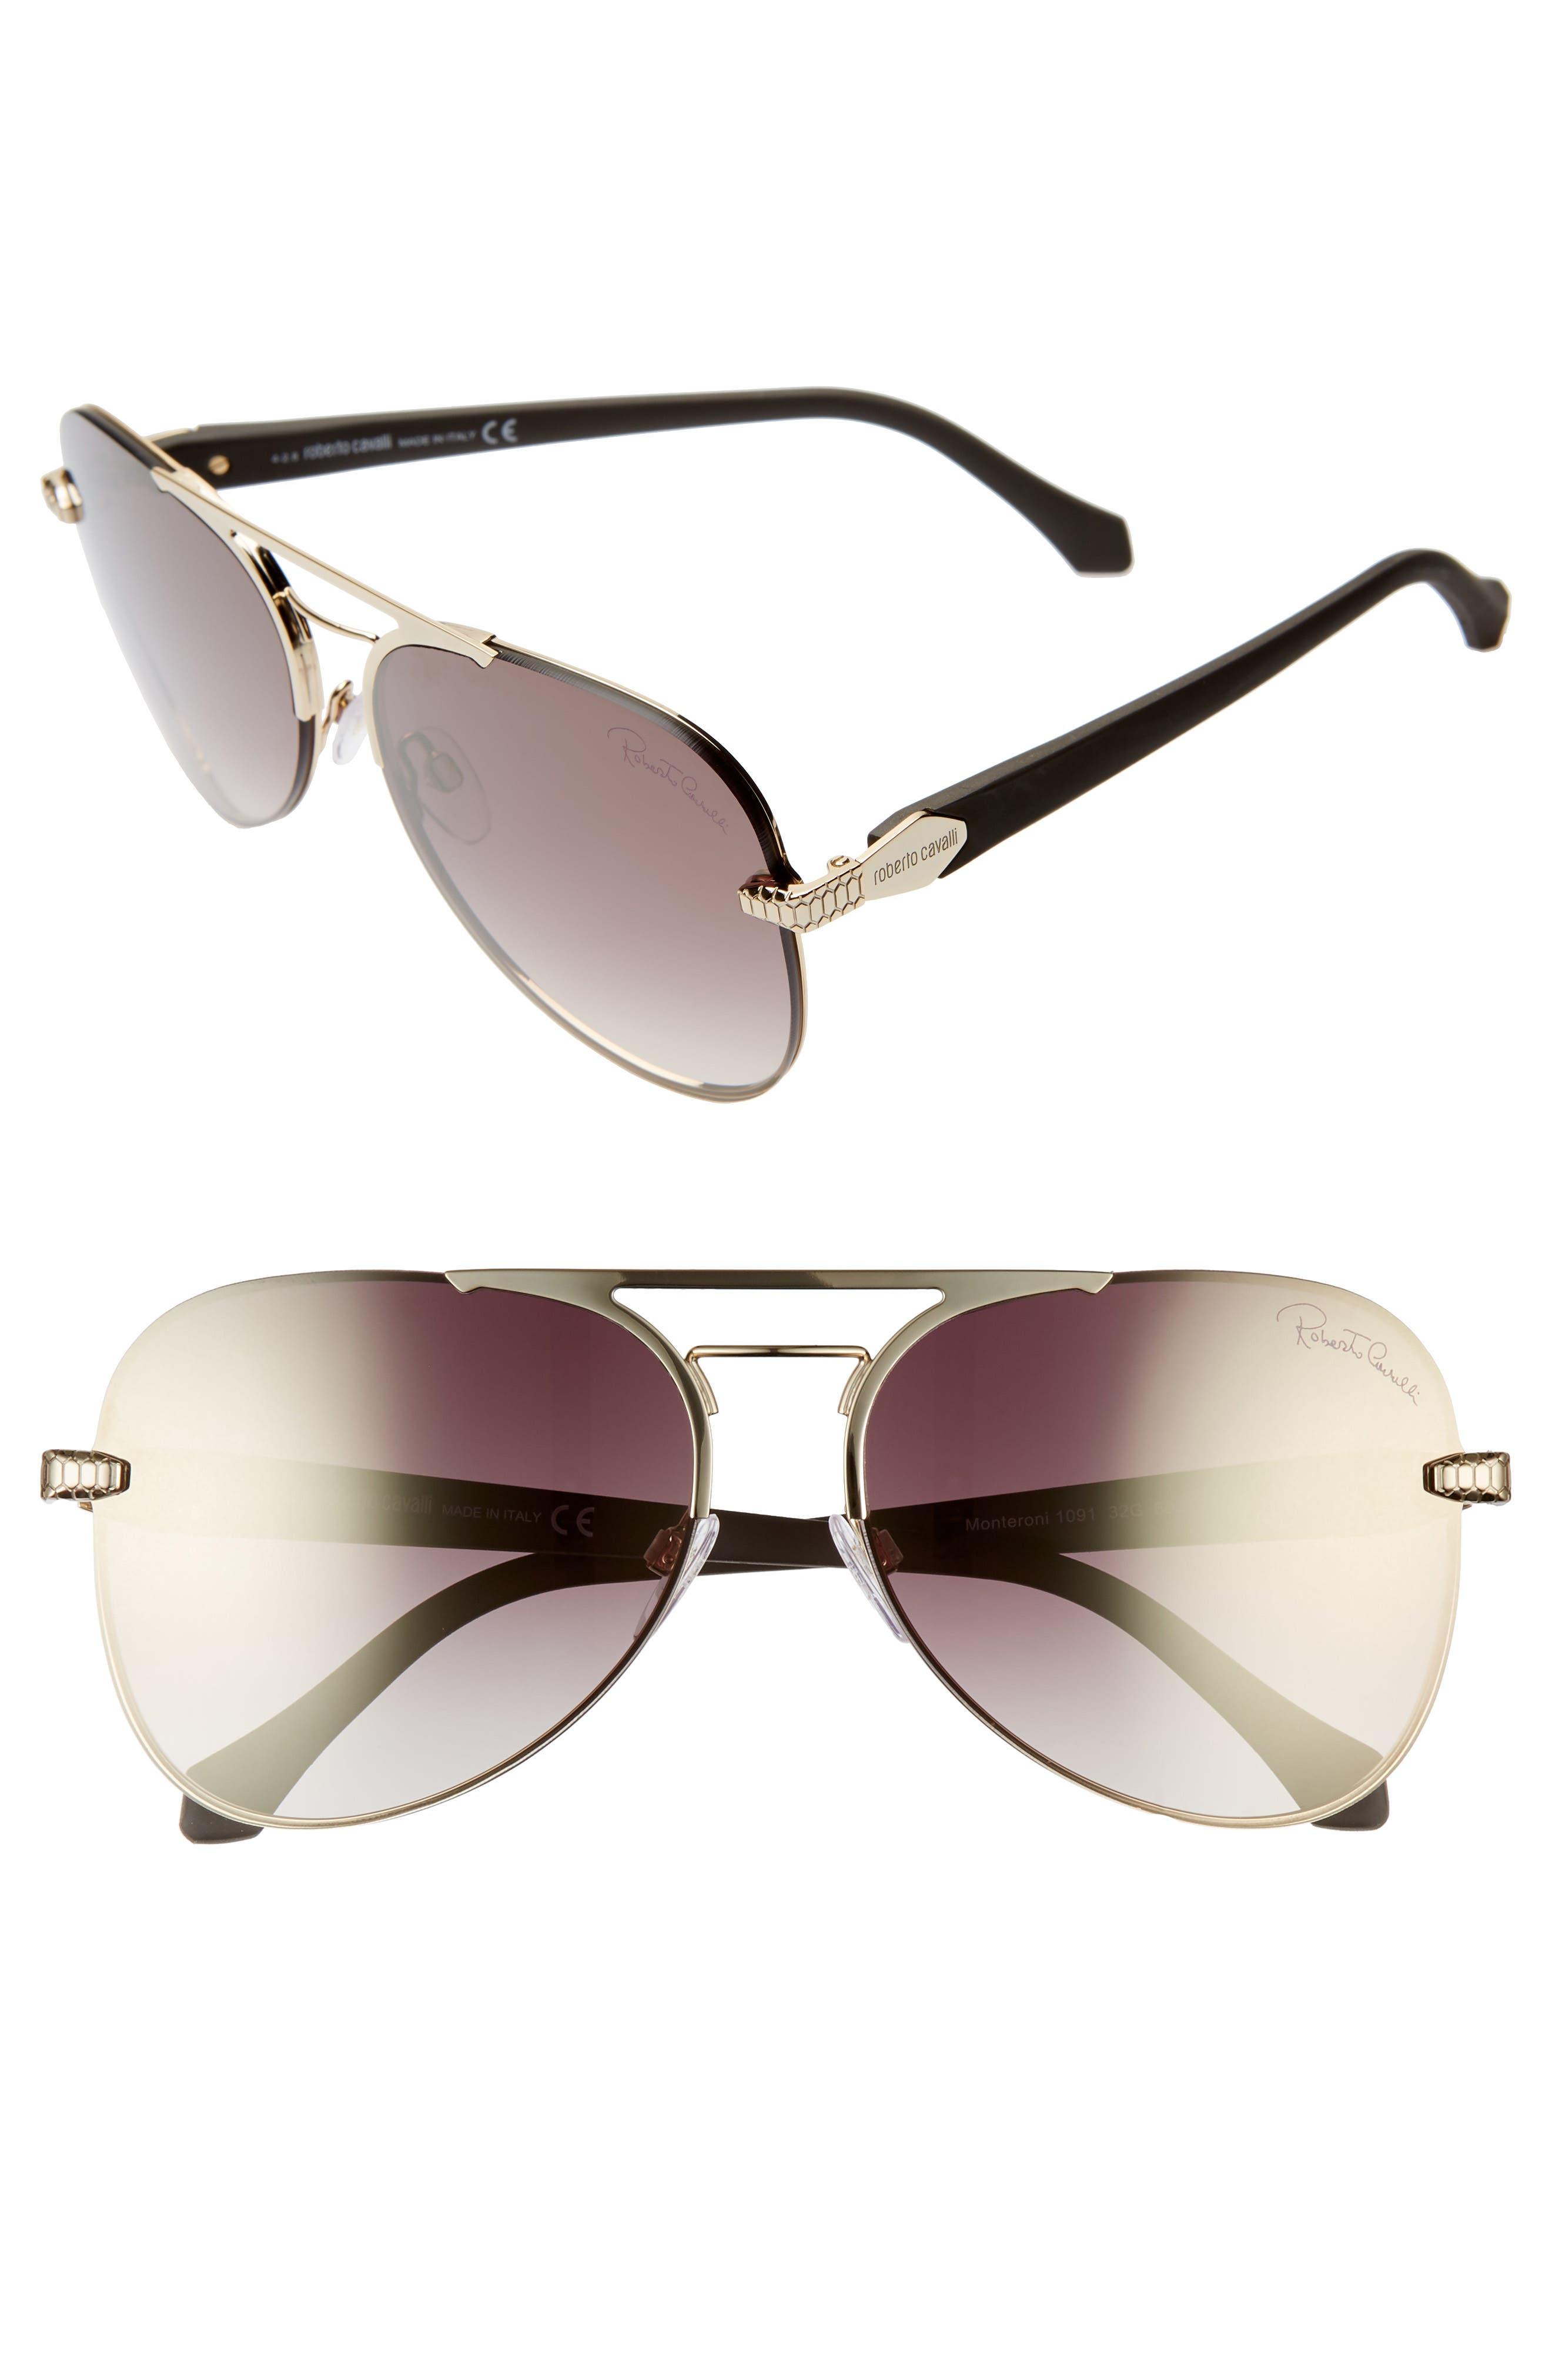 Roberto Cavalli 60Mm Mirrored Aviator Sunglasses - Gold/ Brown Mirror